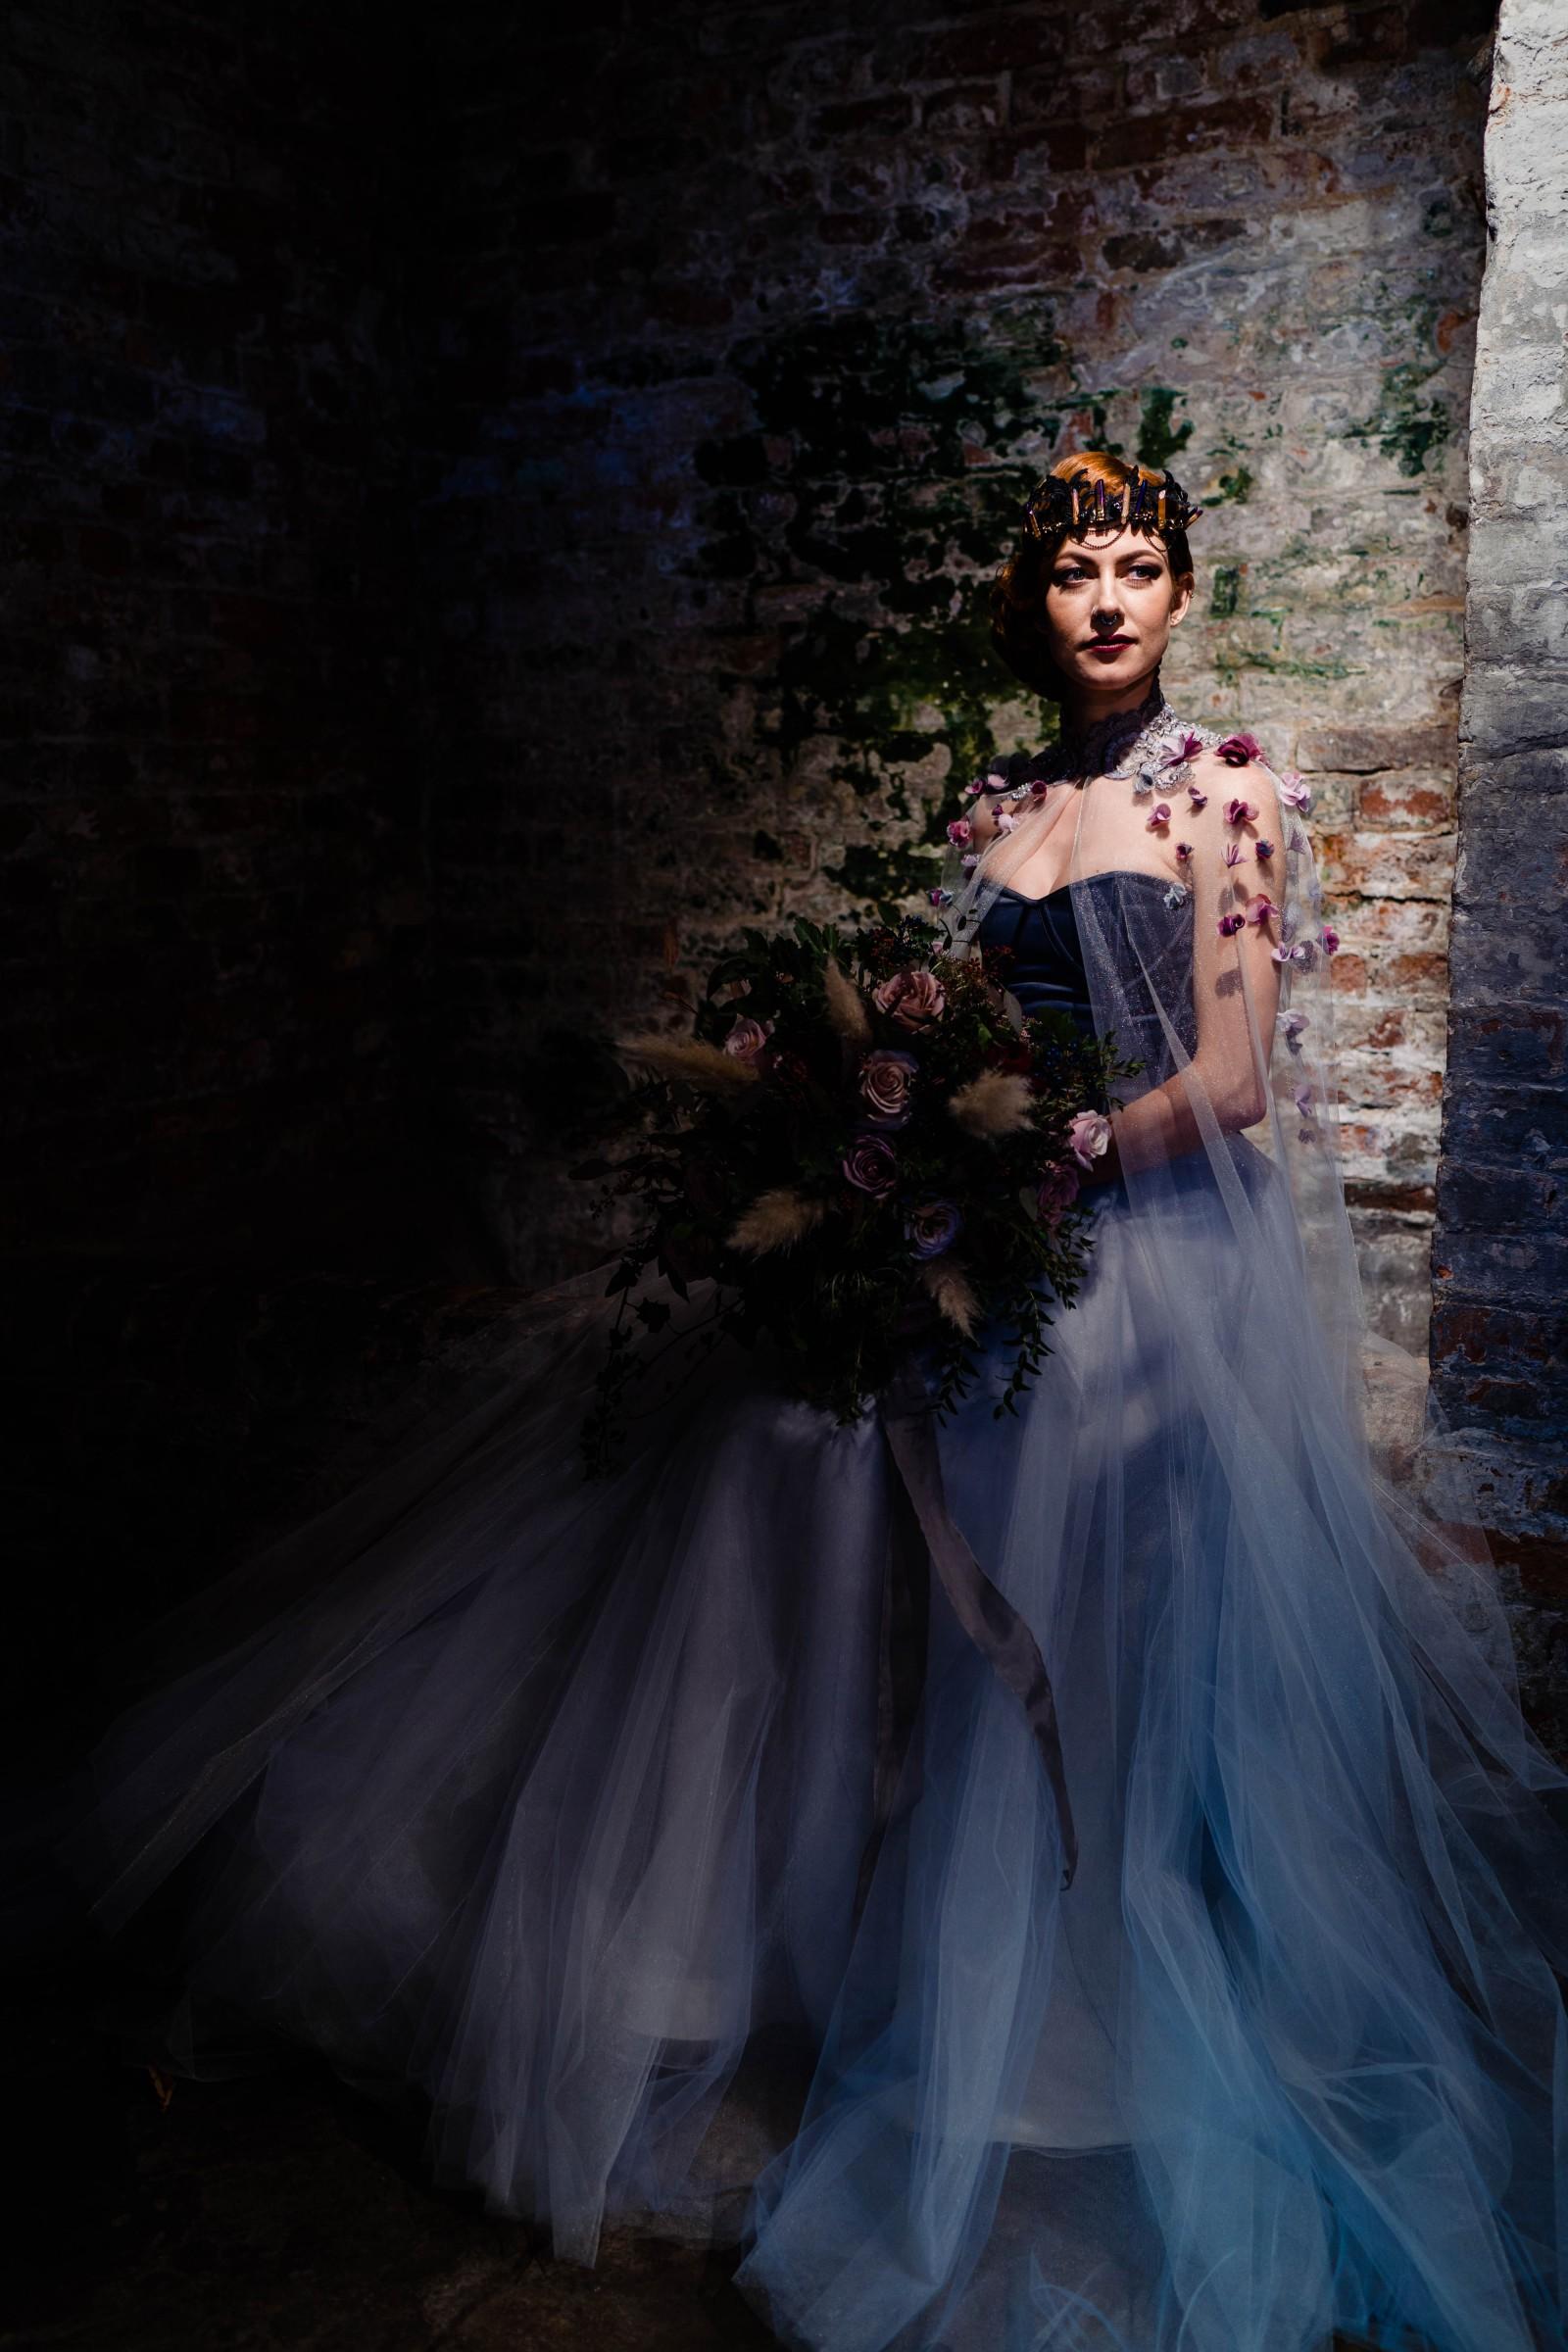 A gothic wedding - national justice museum wedding - alternative wedding - Vicki Clayson Photography 2 (2)